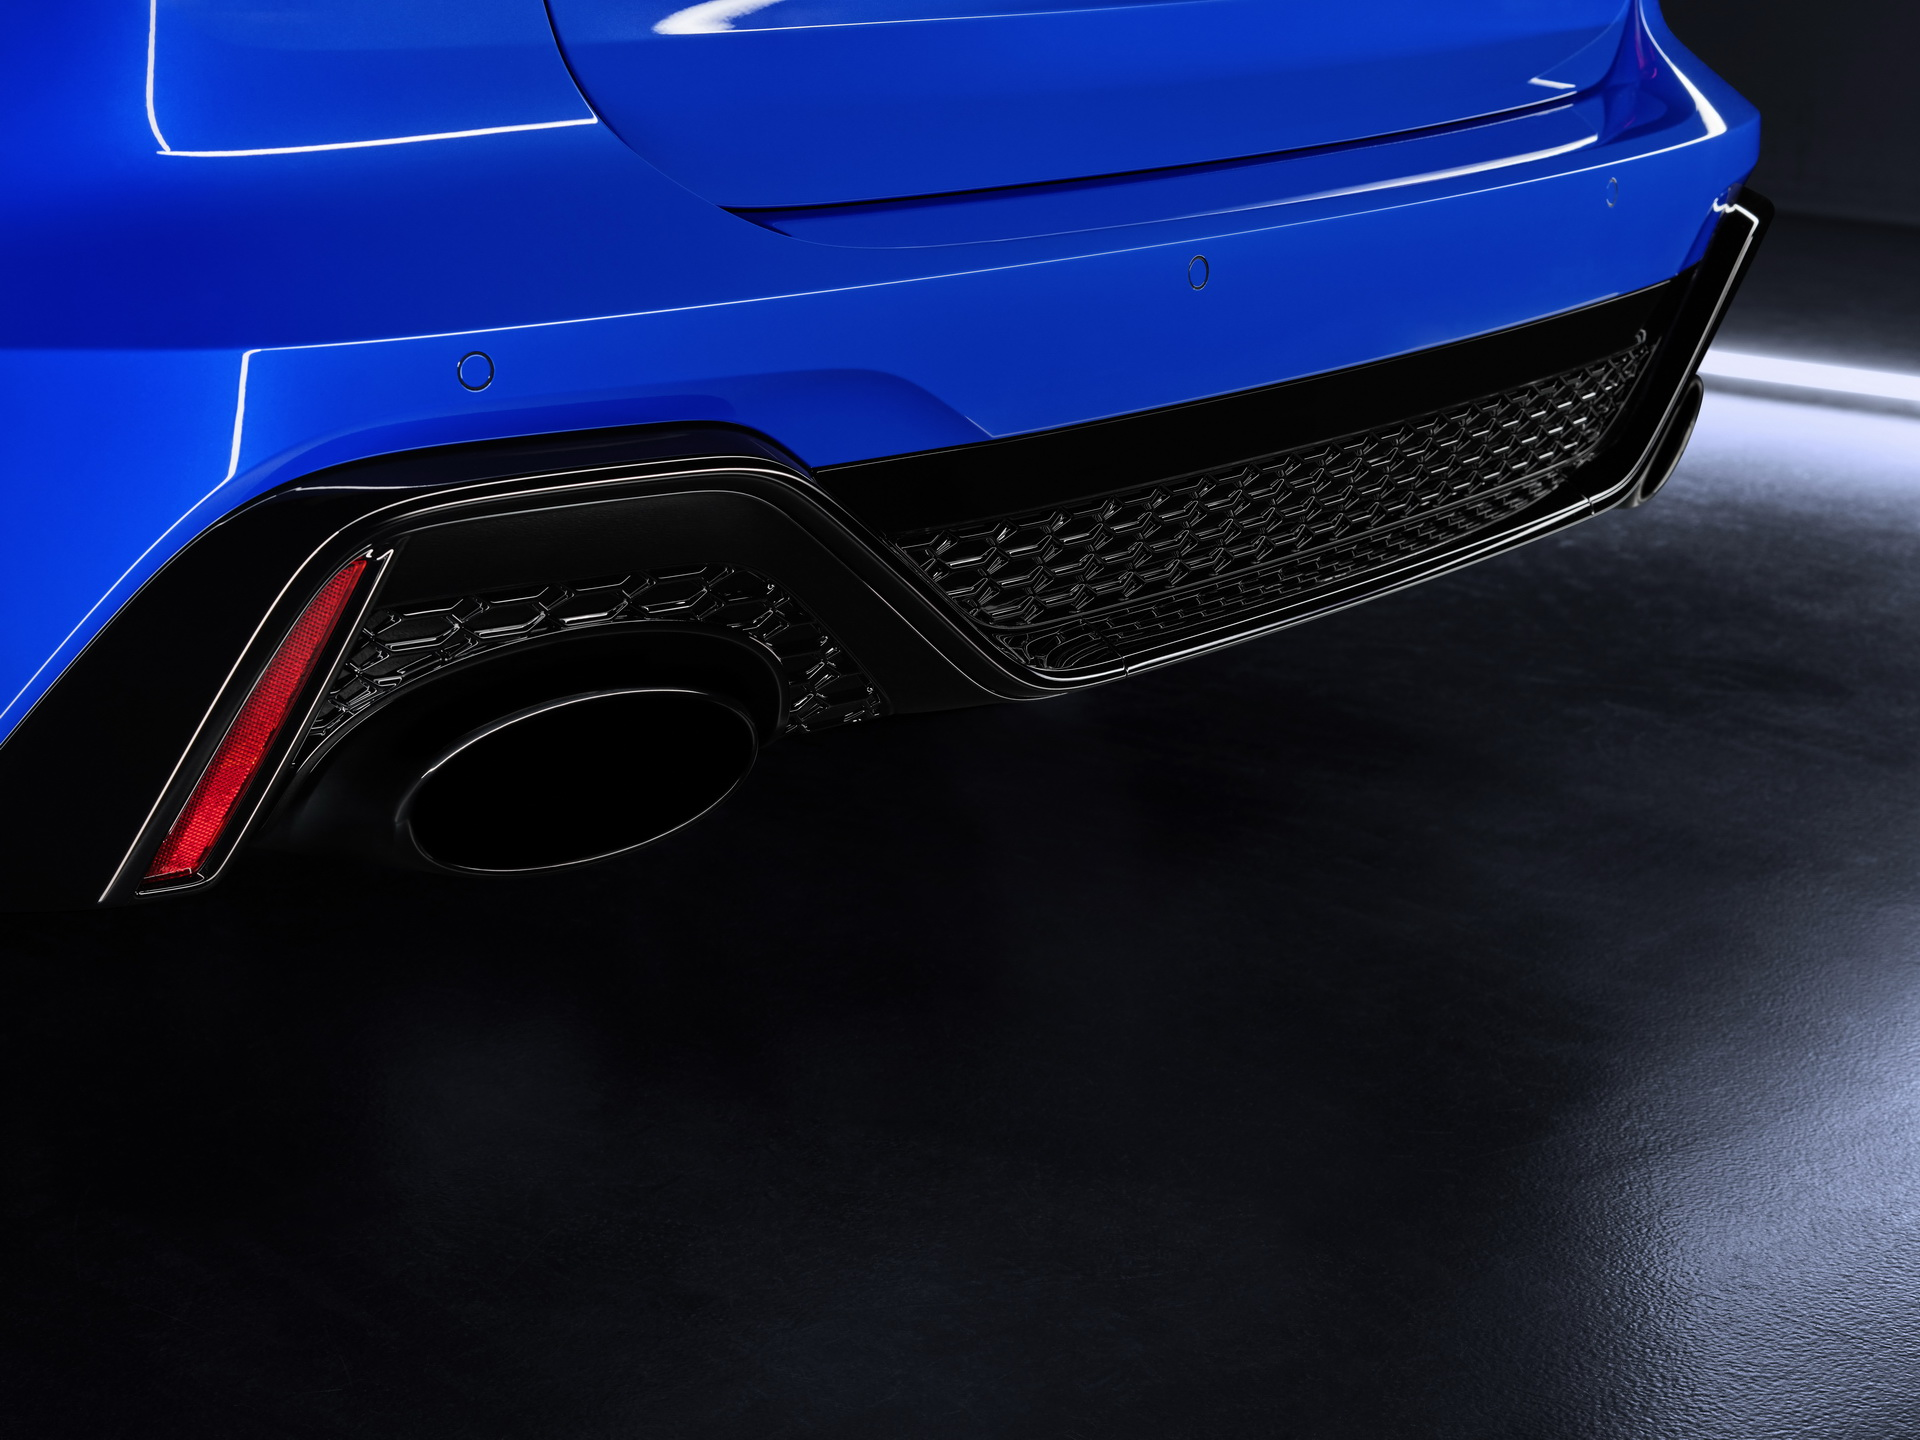 2021-Audi-RS6-Tribute-Edition-09.jpg